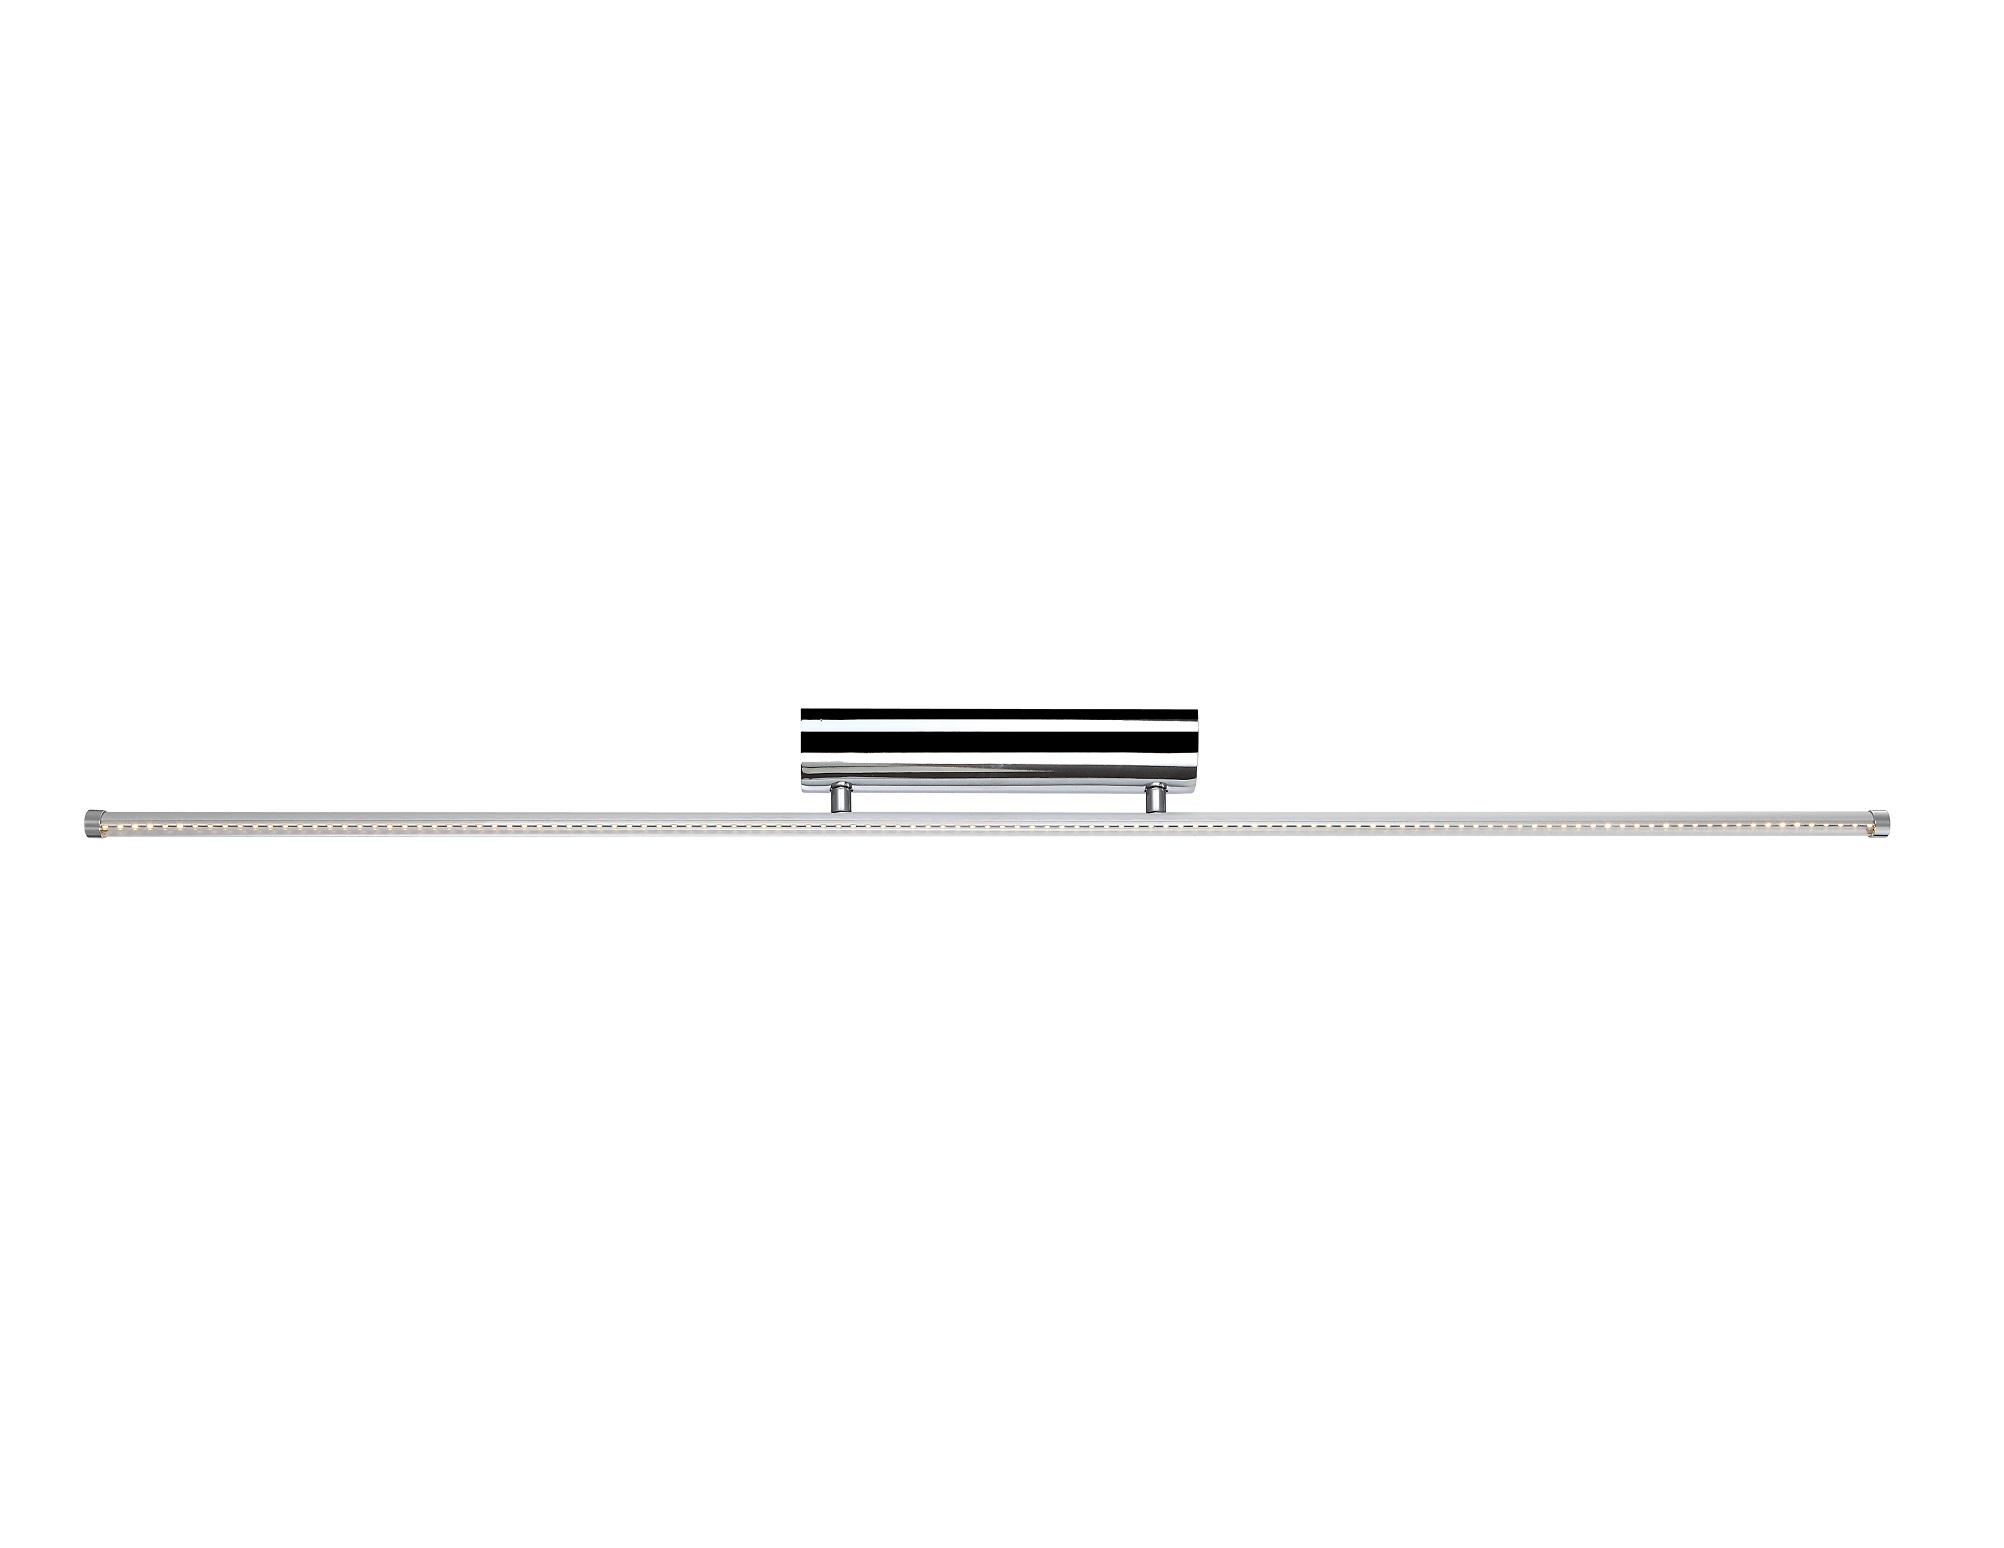 Светильник потолочныйПотолочные светильники<br>Светильник потолочный, арт. 68048-12D, 1x12W, LED, хром Вид цоколя: 12 Количество ламп: 1 Наличие ламп: в комплекте&amp;lt;div&amp;gt;&amp;lt;br&amp;gt;&amp;lt;/div&amp;gt;&amp;lt;div&amp;gt;&amp;lt;div&amp;gt;Вид цоколя: LED&amp;lt;/div&amp;gt;&amp;lt;div&amp;gt;Мощность: &amp;amp;nbsp;12W&amp;lt;/div&amp;gt;&amp;lt;div&amp;gt;Количество ламп: 1 (есть в комплекте)&amp;lt;/div&amp;gt;&amp;lt;/div&amp;gt;<br><br>Material: Металл<br>Length см: None<br>Width см: 114<br>Depth см: 6,5<br>Height см: 7,4<br>Diameter см: None